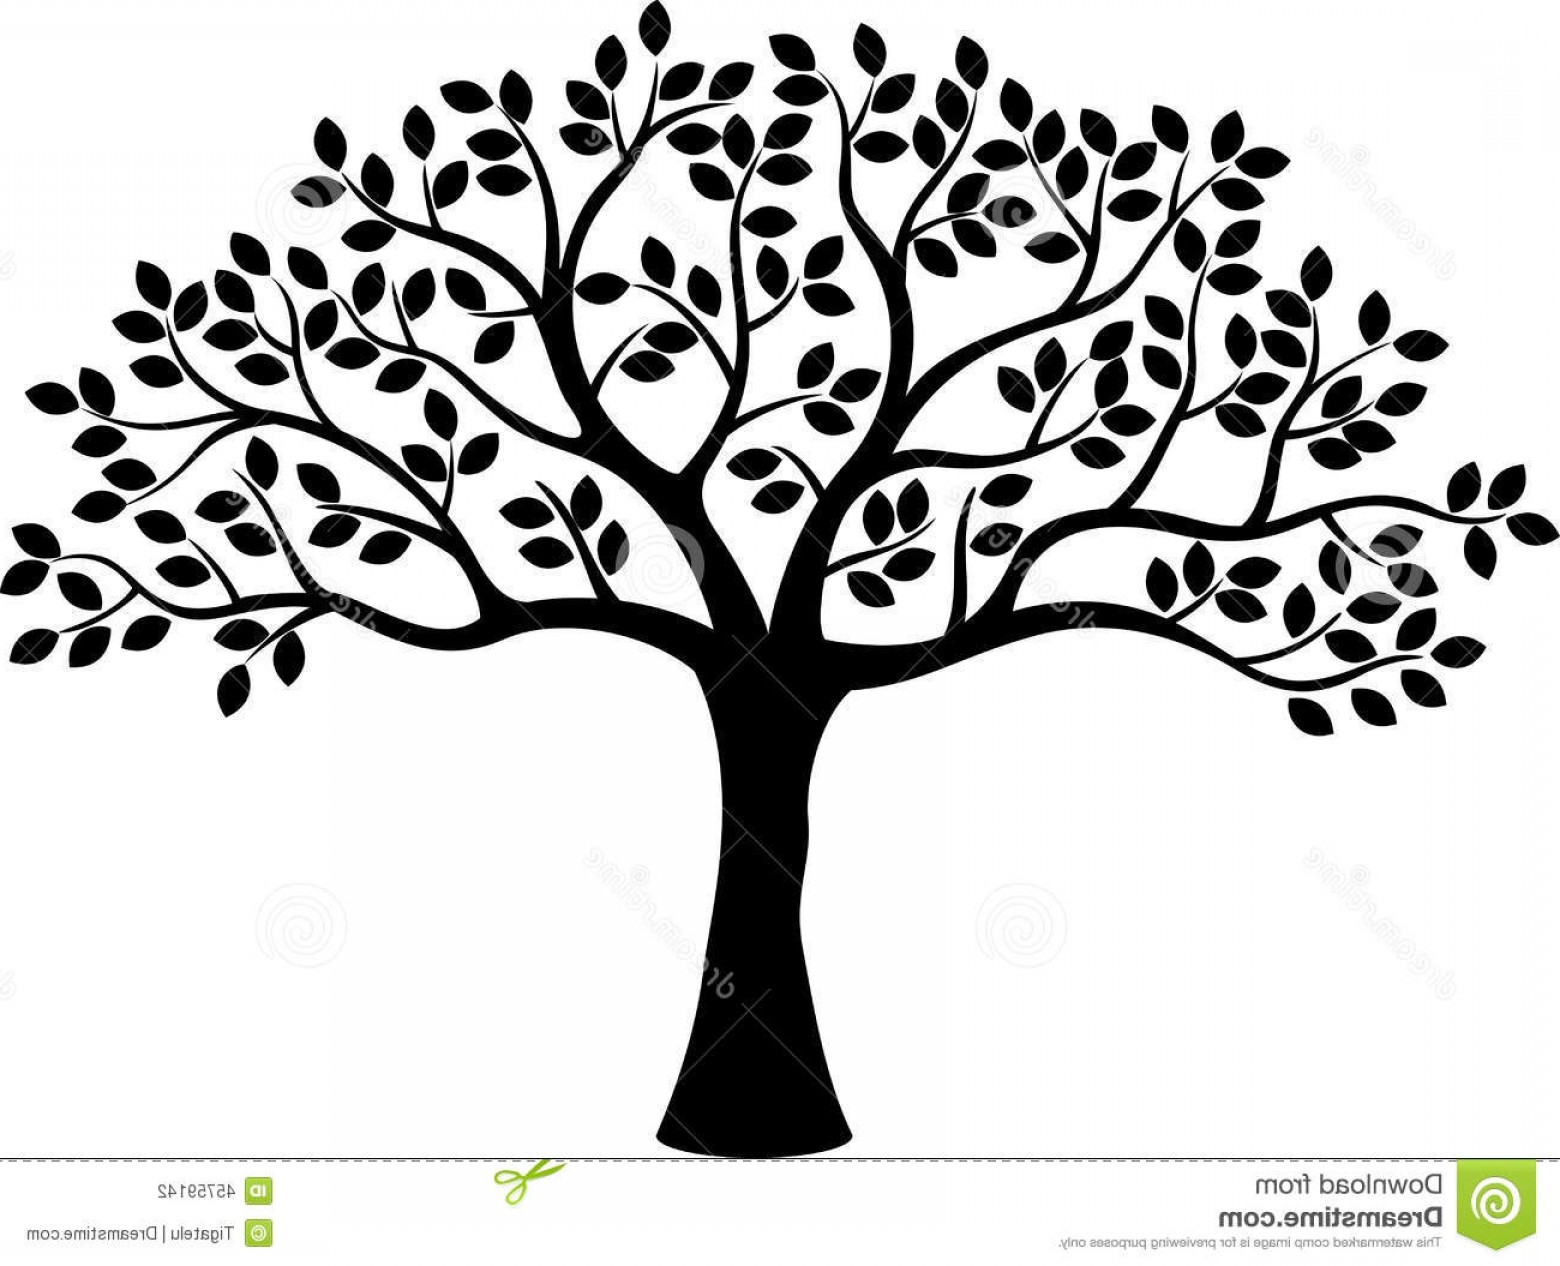 1560x1266 Stock Illustration Tree Silhouette Cartoon Illustration Image